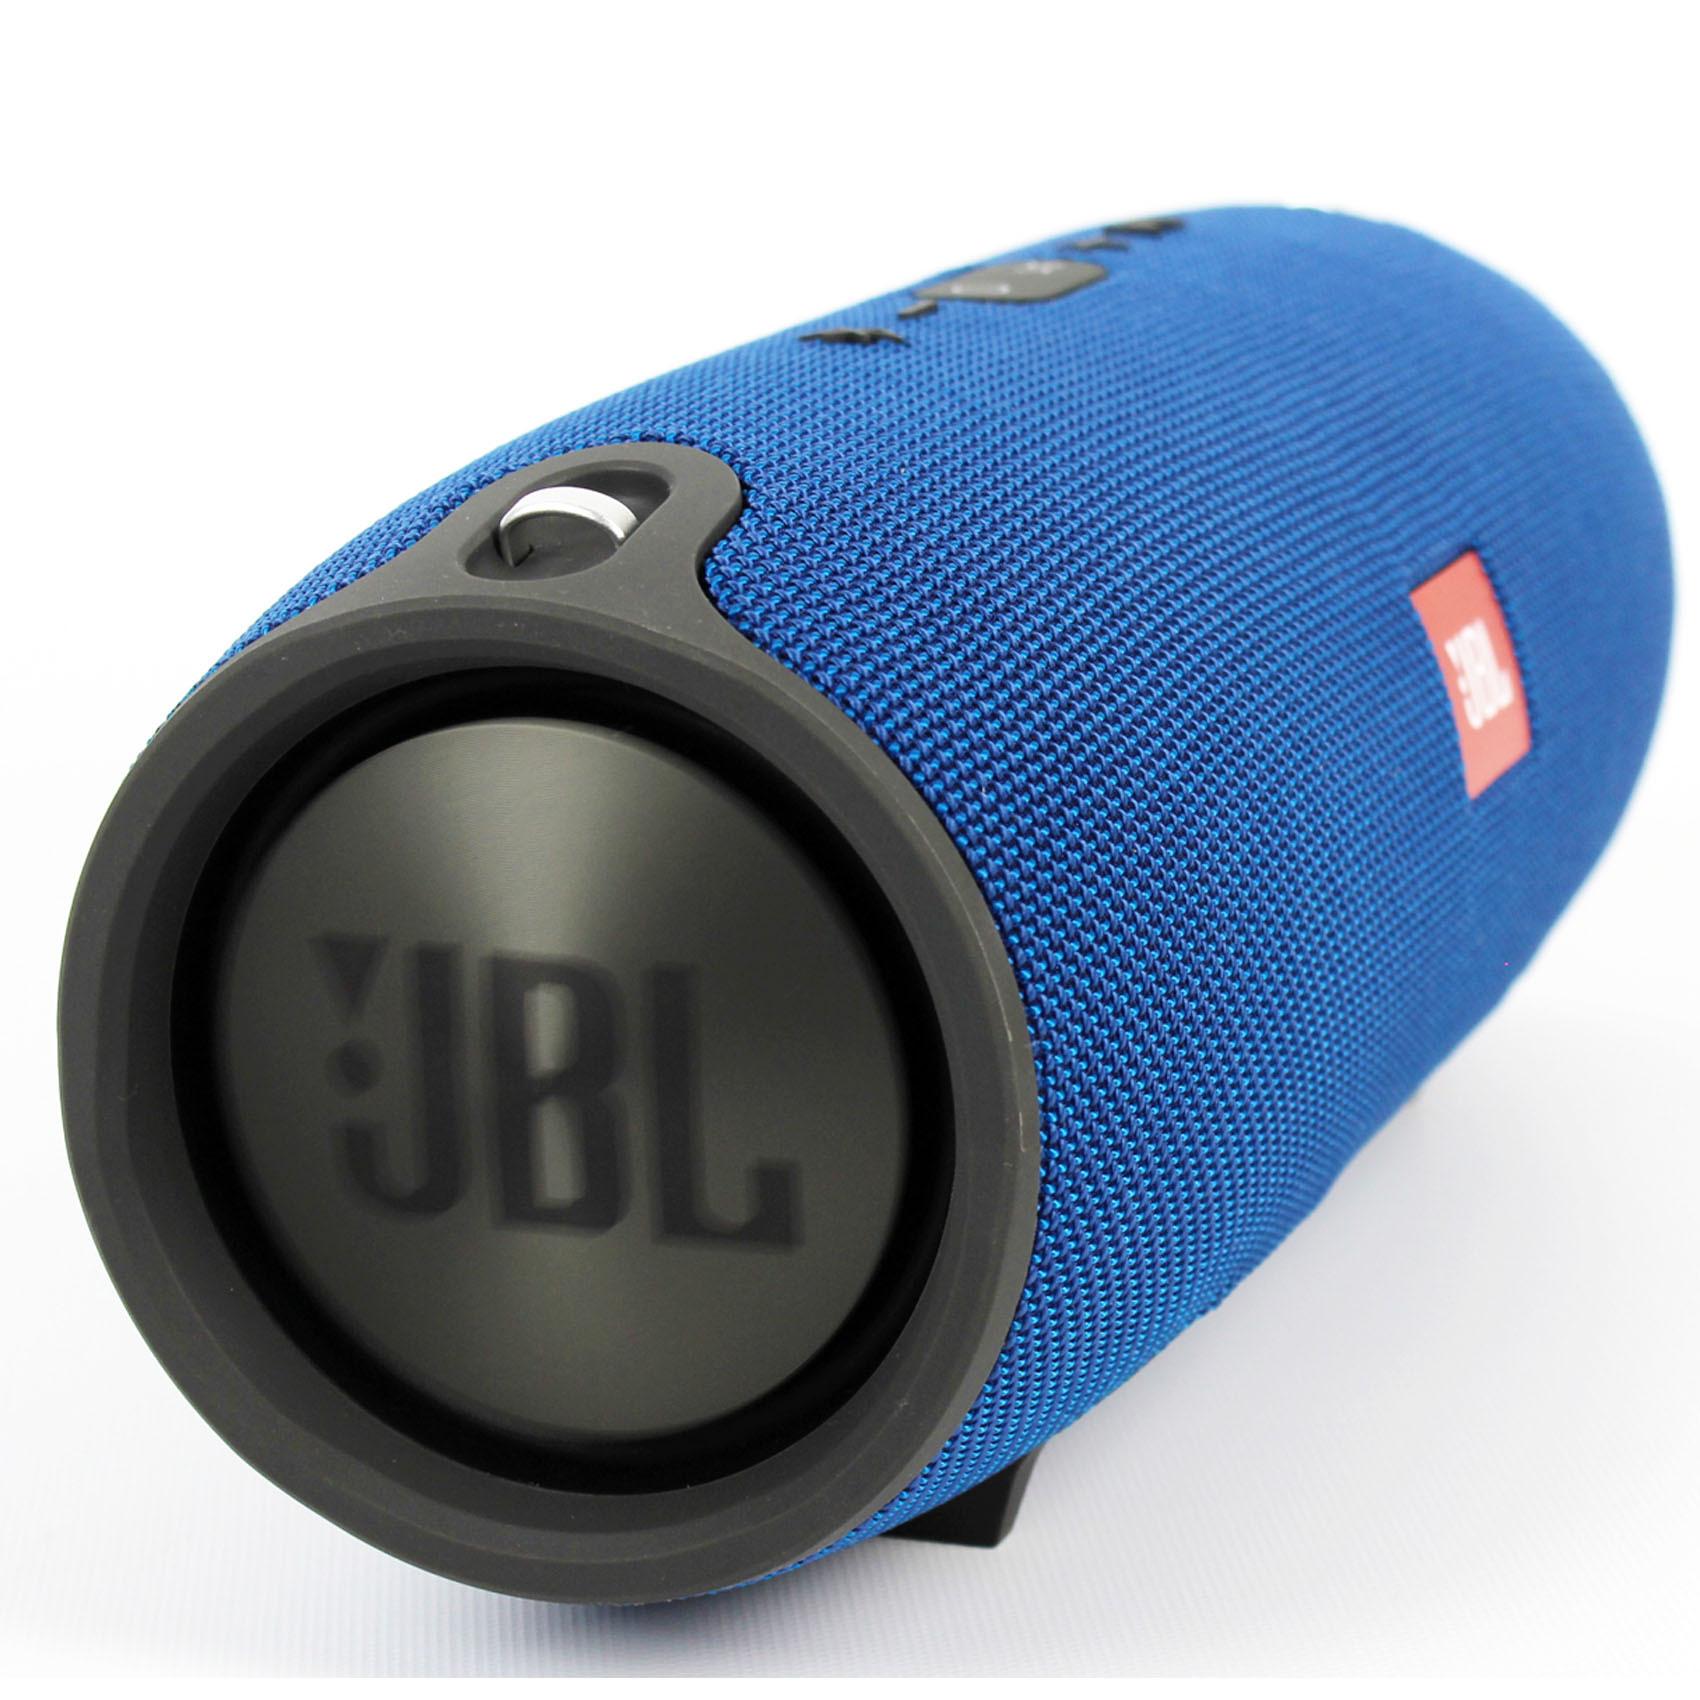 JBL SPK W/L XTREME BL